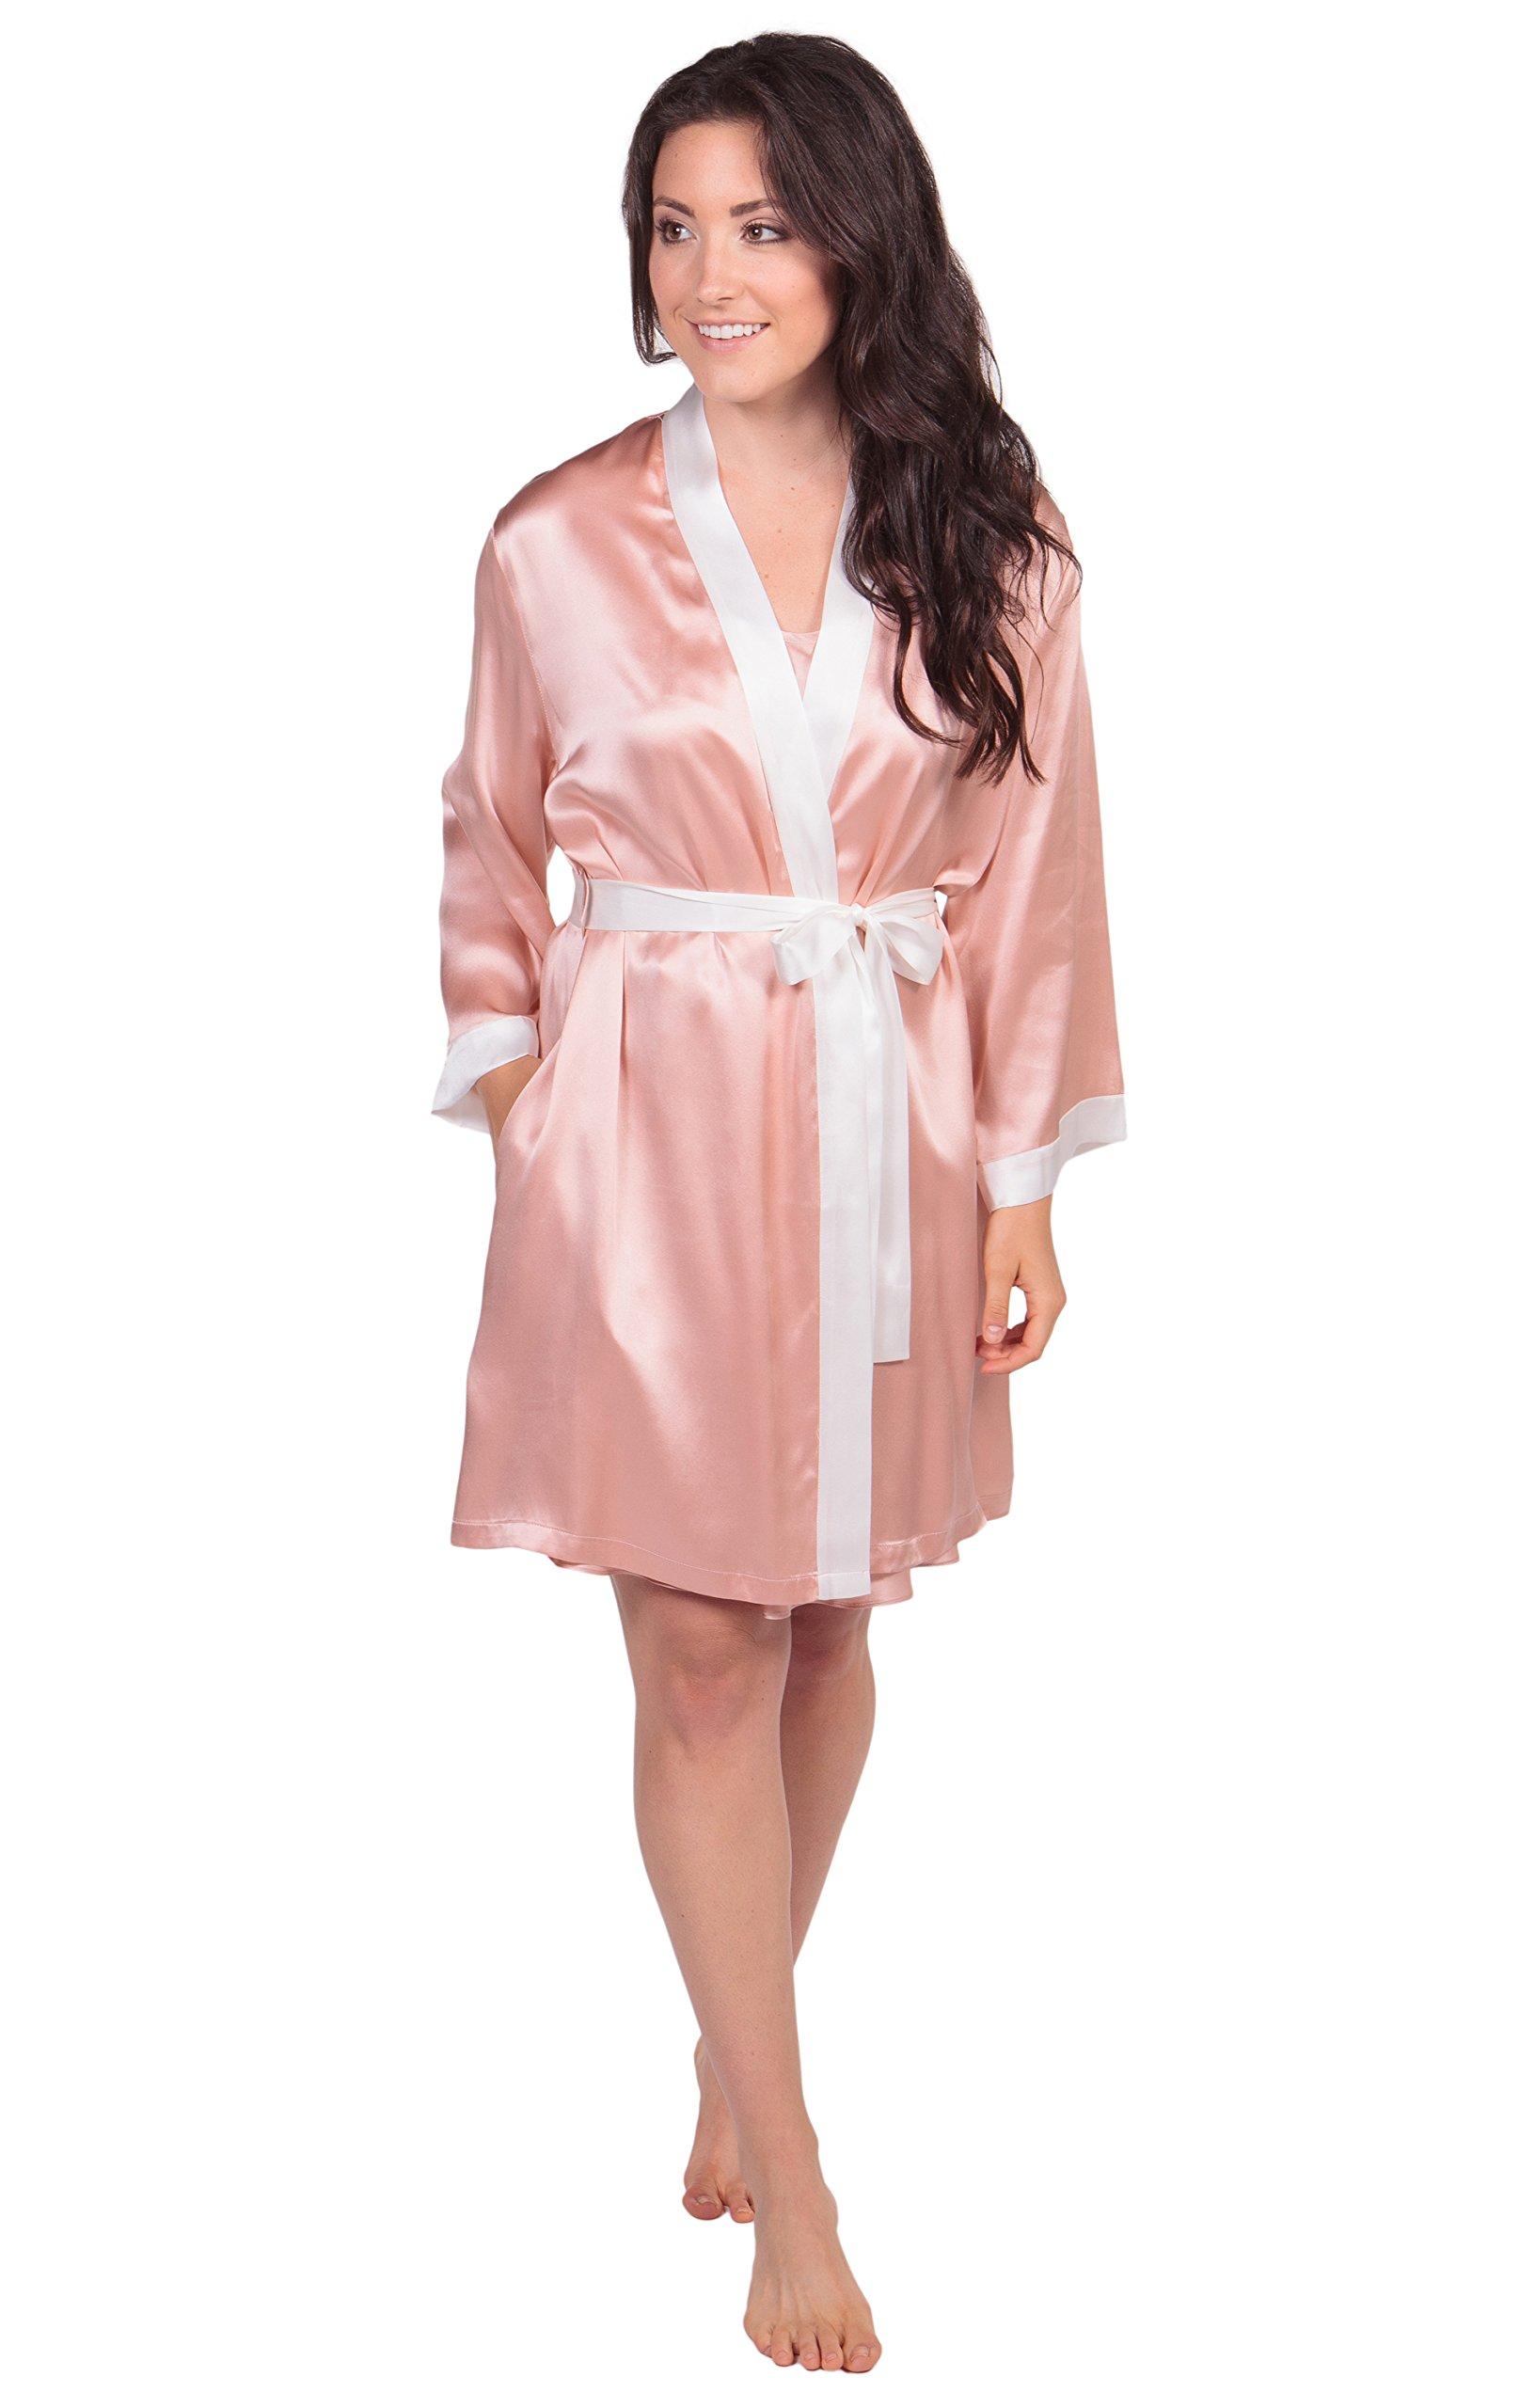 Women's Silk Chemise & Robe Set - Classic Gift by TexereSilk (Silk Silhouette, Evening Sand, Medium) Best Nightwear for Her WS0606-ESD-M